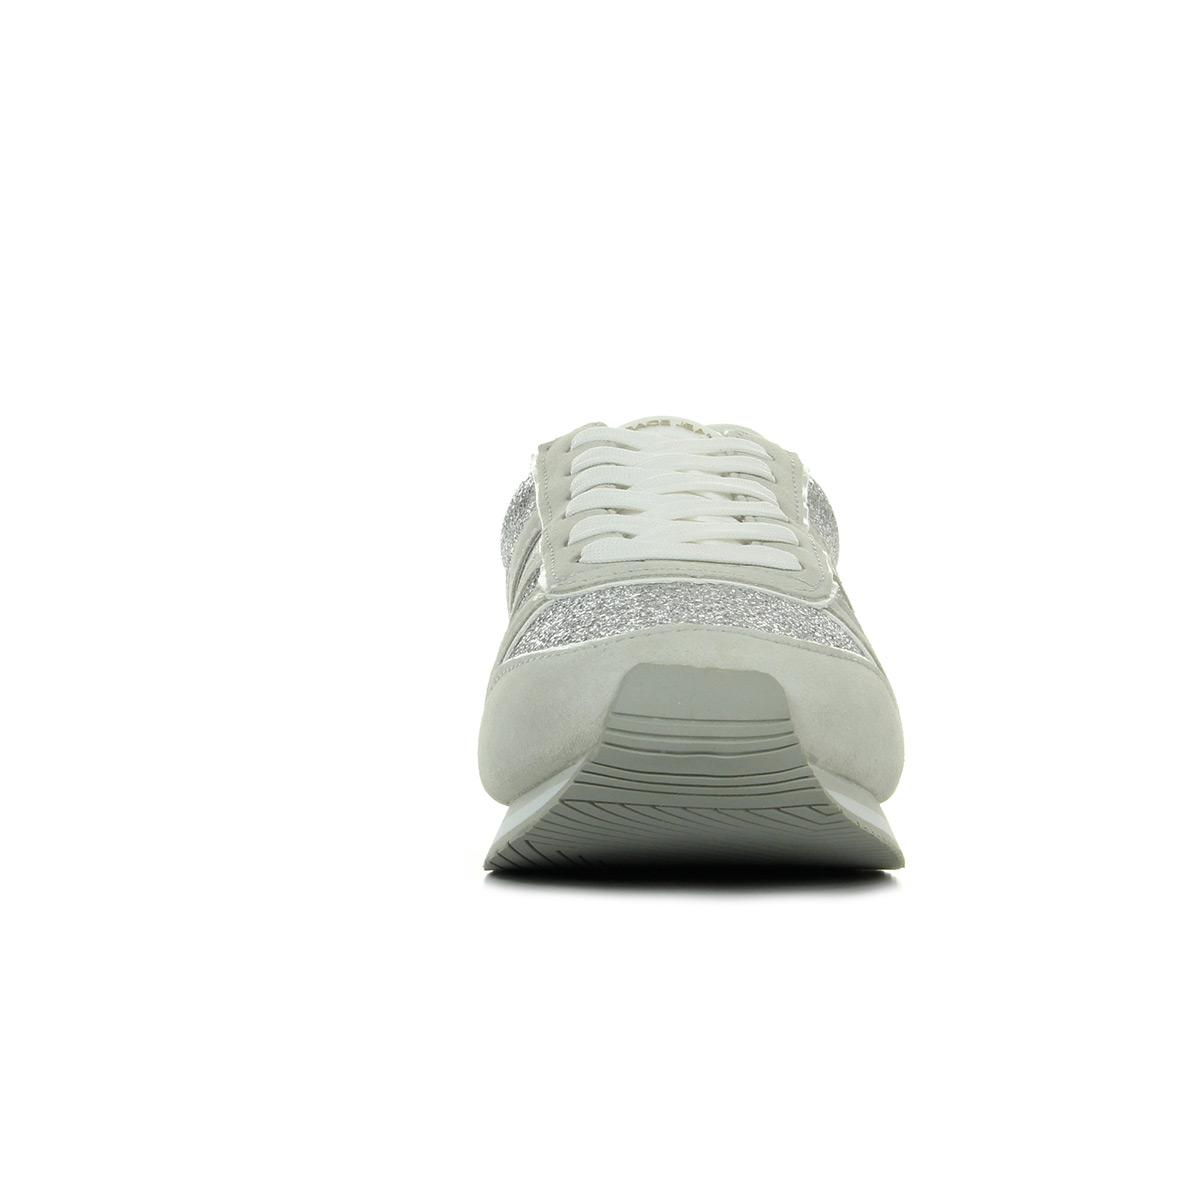 Chaussures Baskets Versace Jeans femme Linea Fondo Stella Dis1 Suede ... 652ae324073